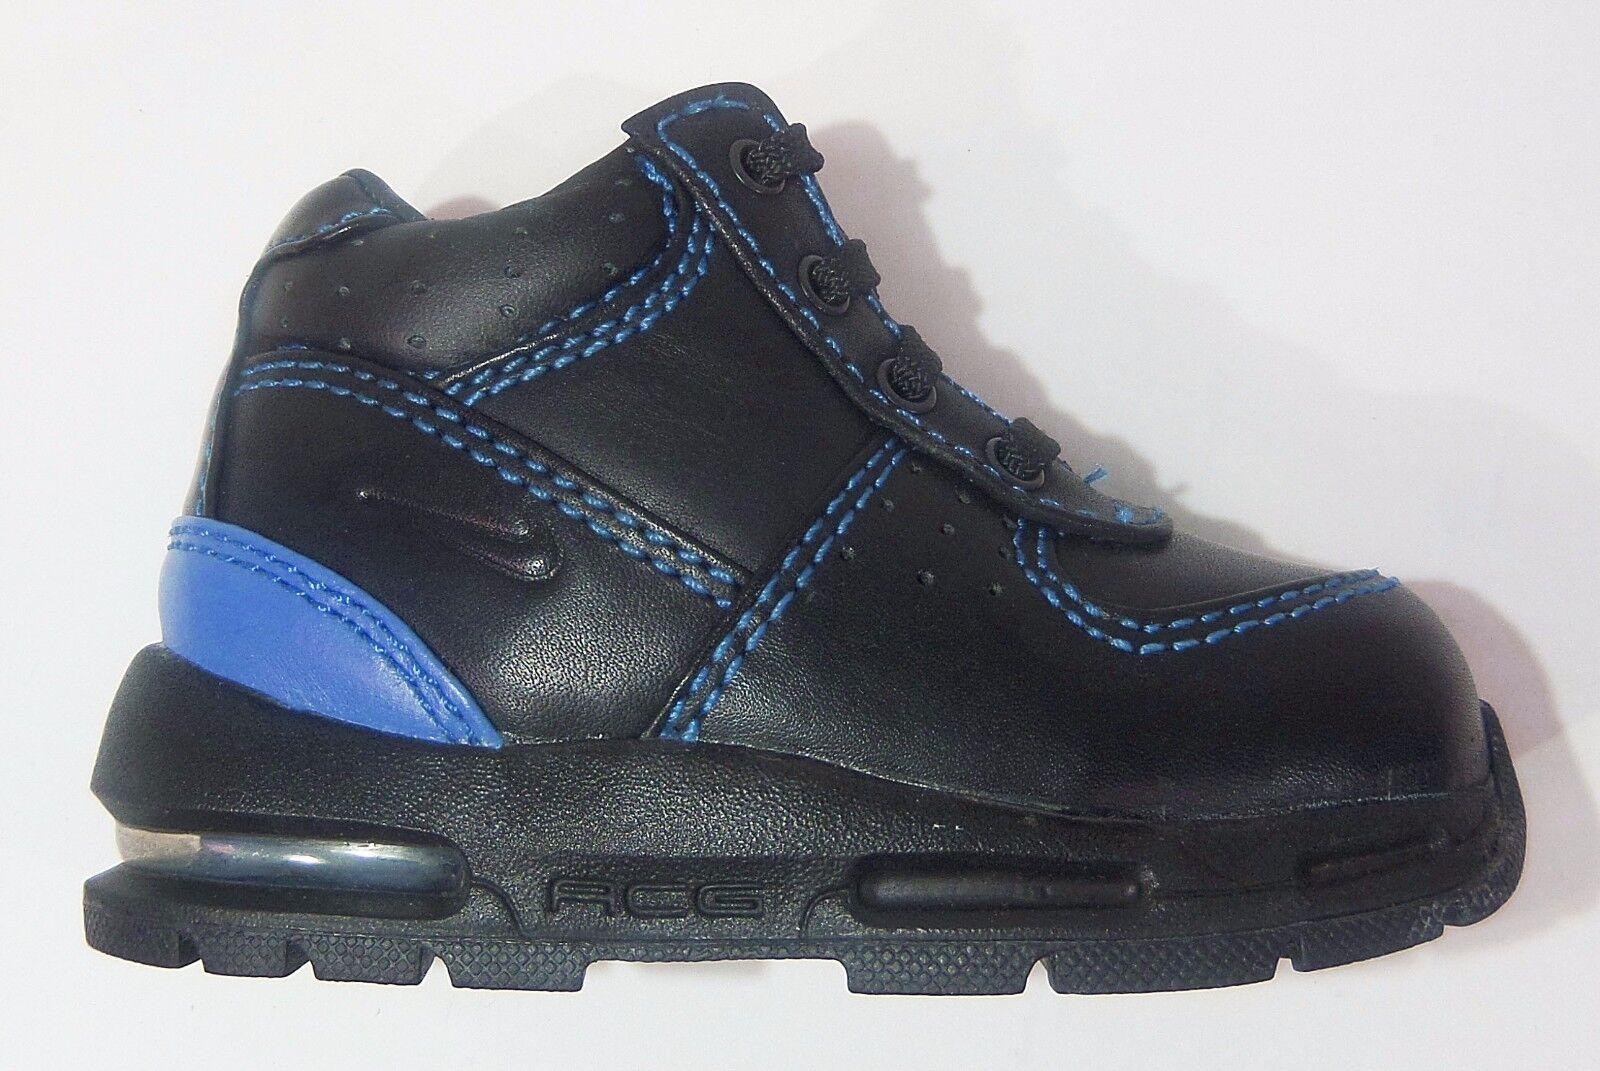 Nike Kids' Infant & Toddler AIR MAX GOADOME Shoes Black/Royal 311569-003 a9